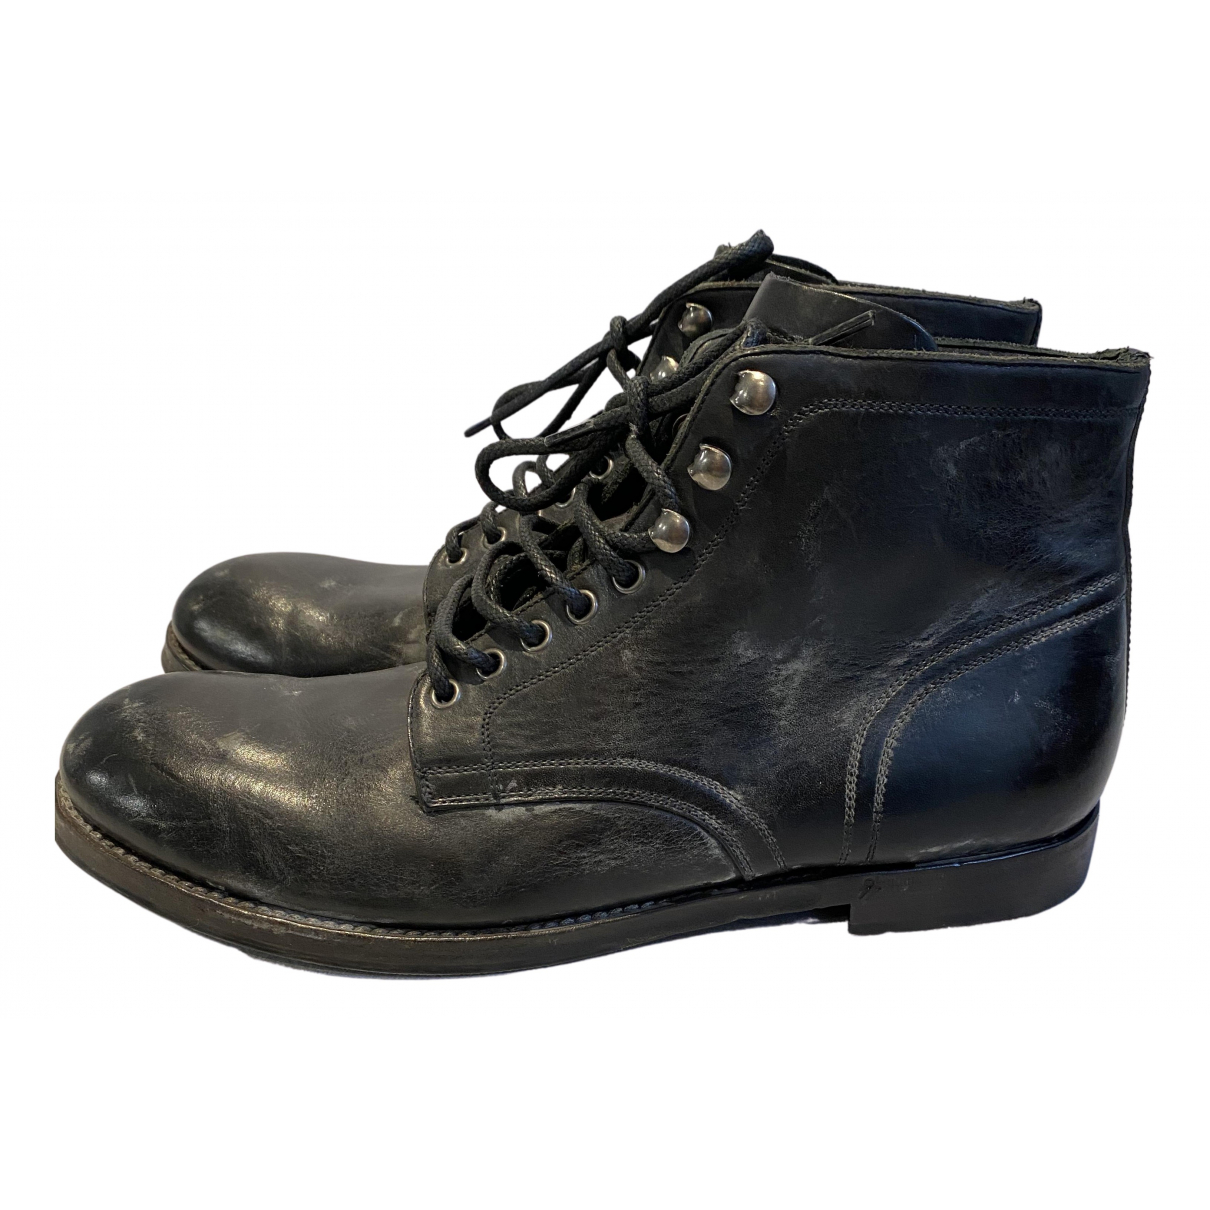 Dolce Vita N Black Leather Boots for Men 10 UK